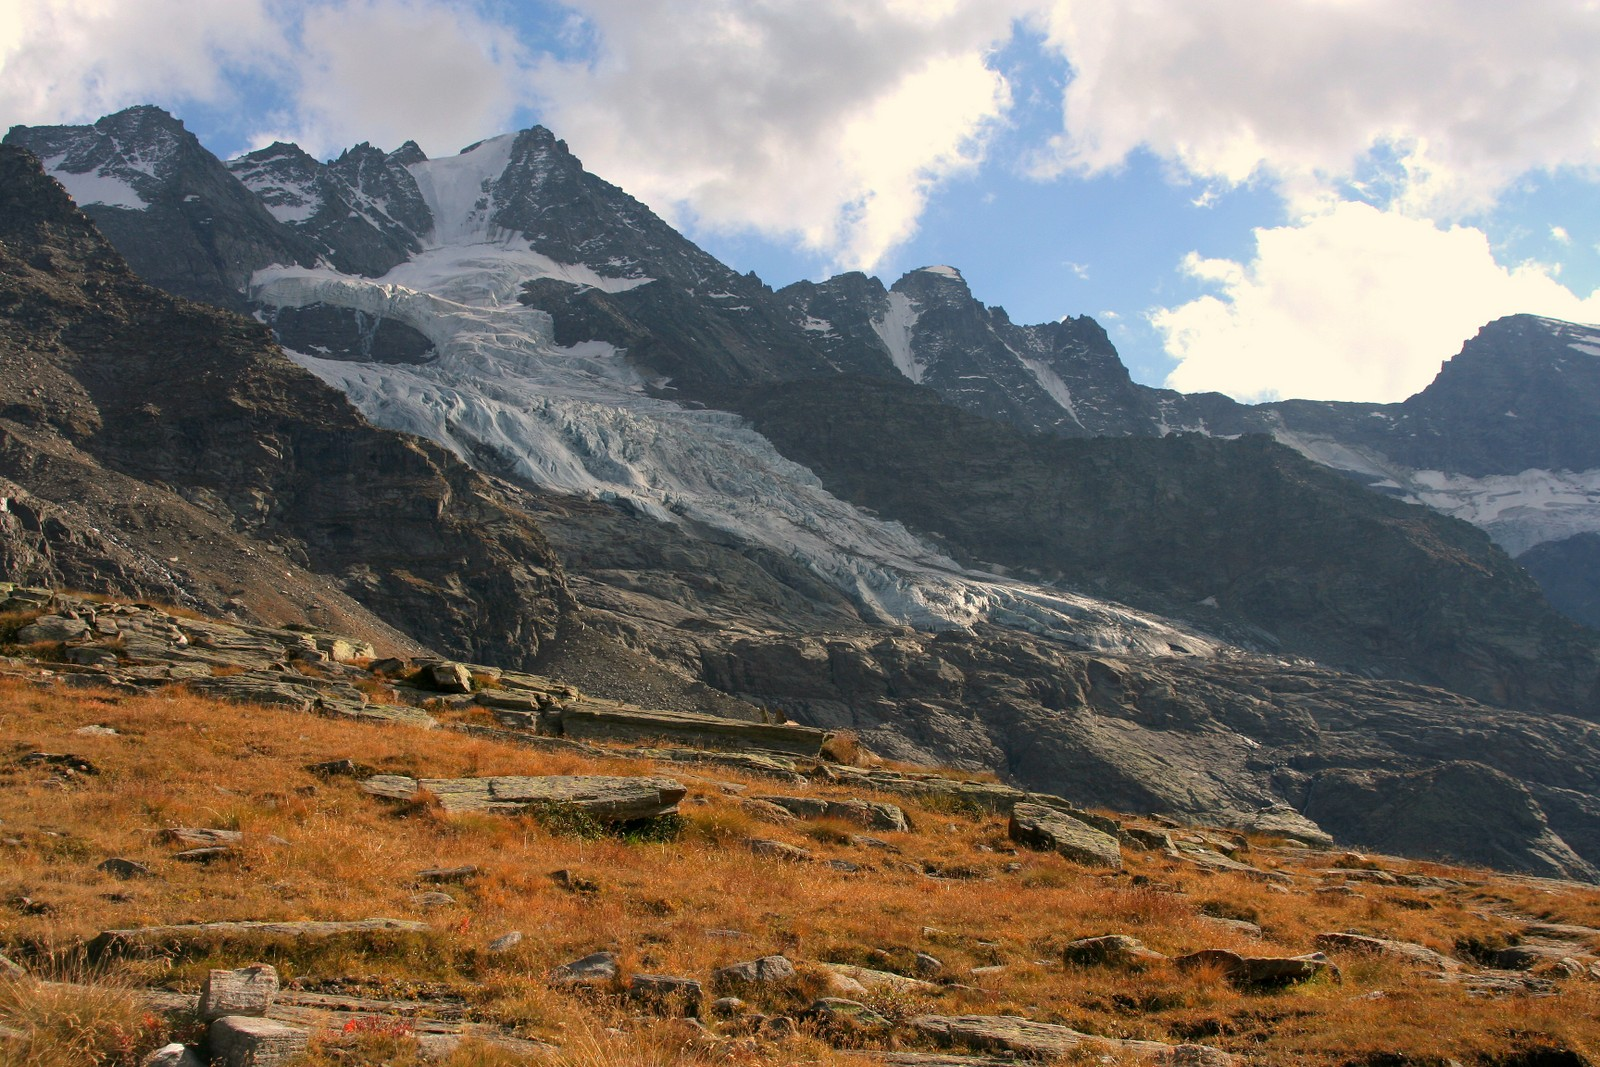 Alpe Money Trail, Parco Nazionale Gran Paradiso